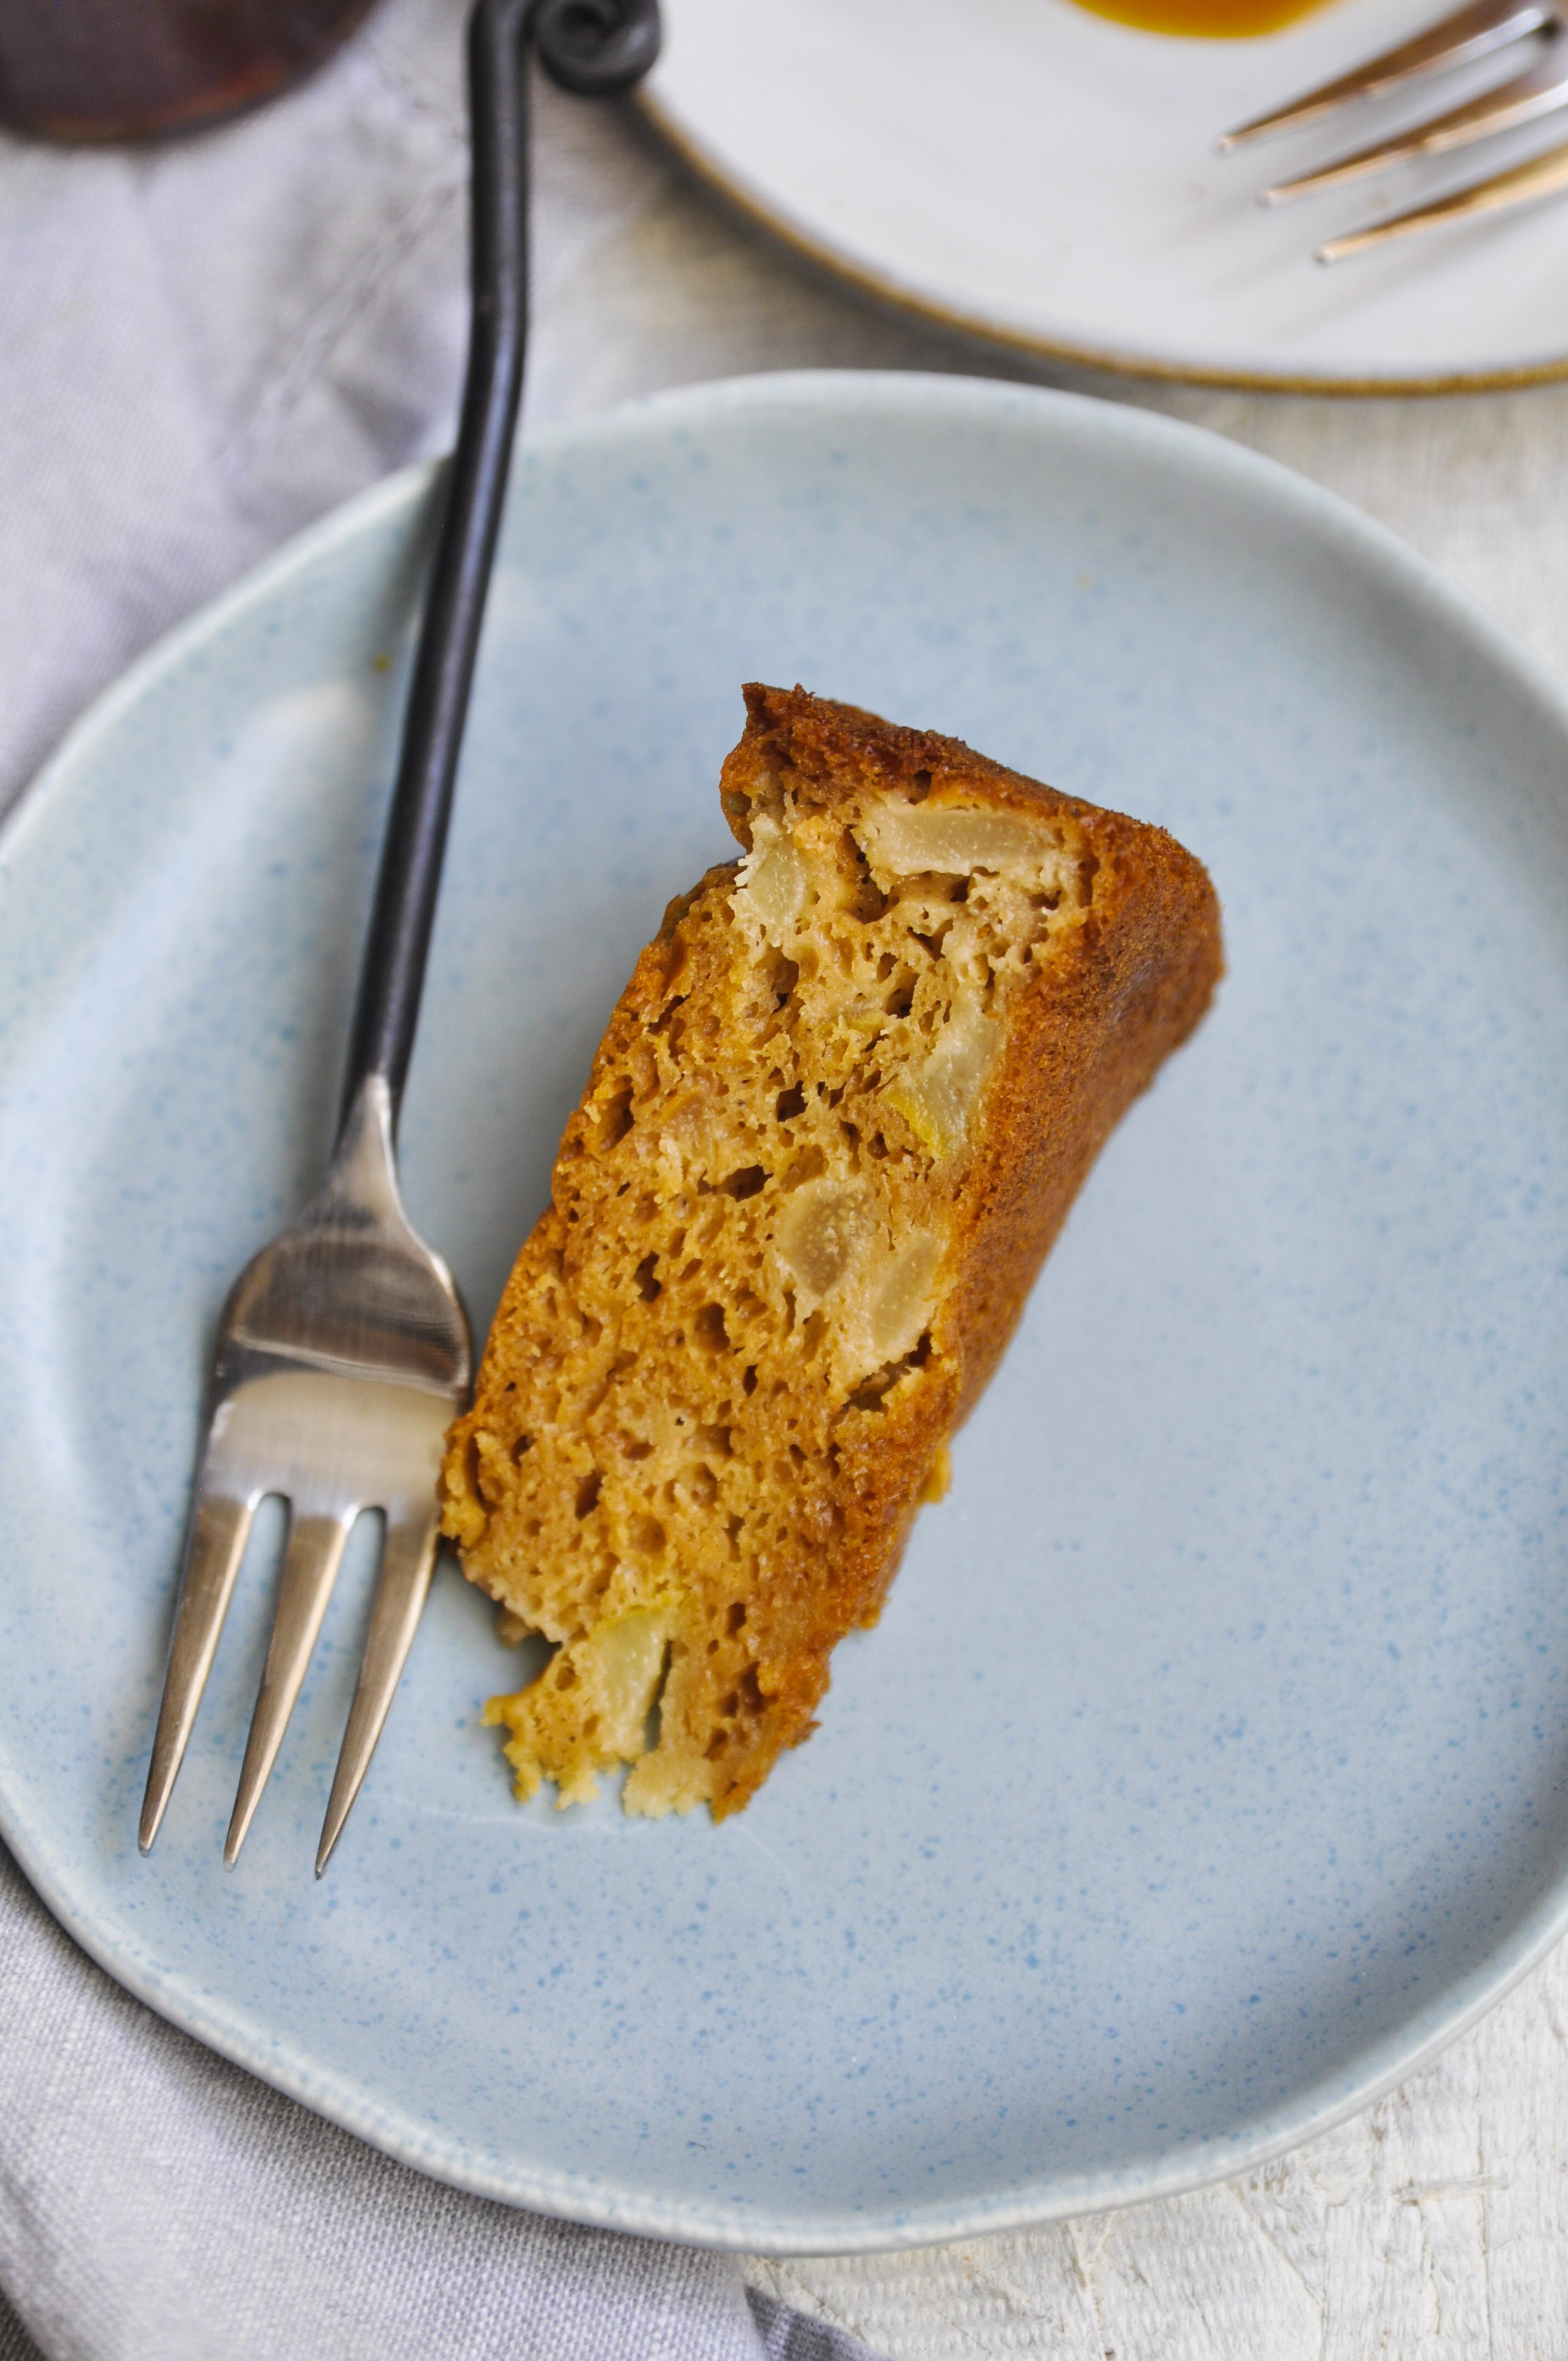 how to make pear cake, apple cake recipe, pear cake recipe, homemade caramel, caramel cake, pear caramel cake, fall recipes, fall baking, myyellowapron